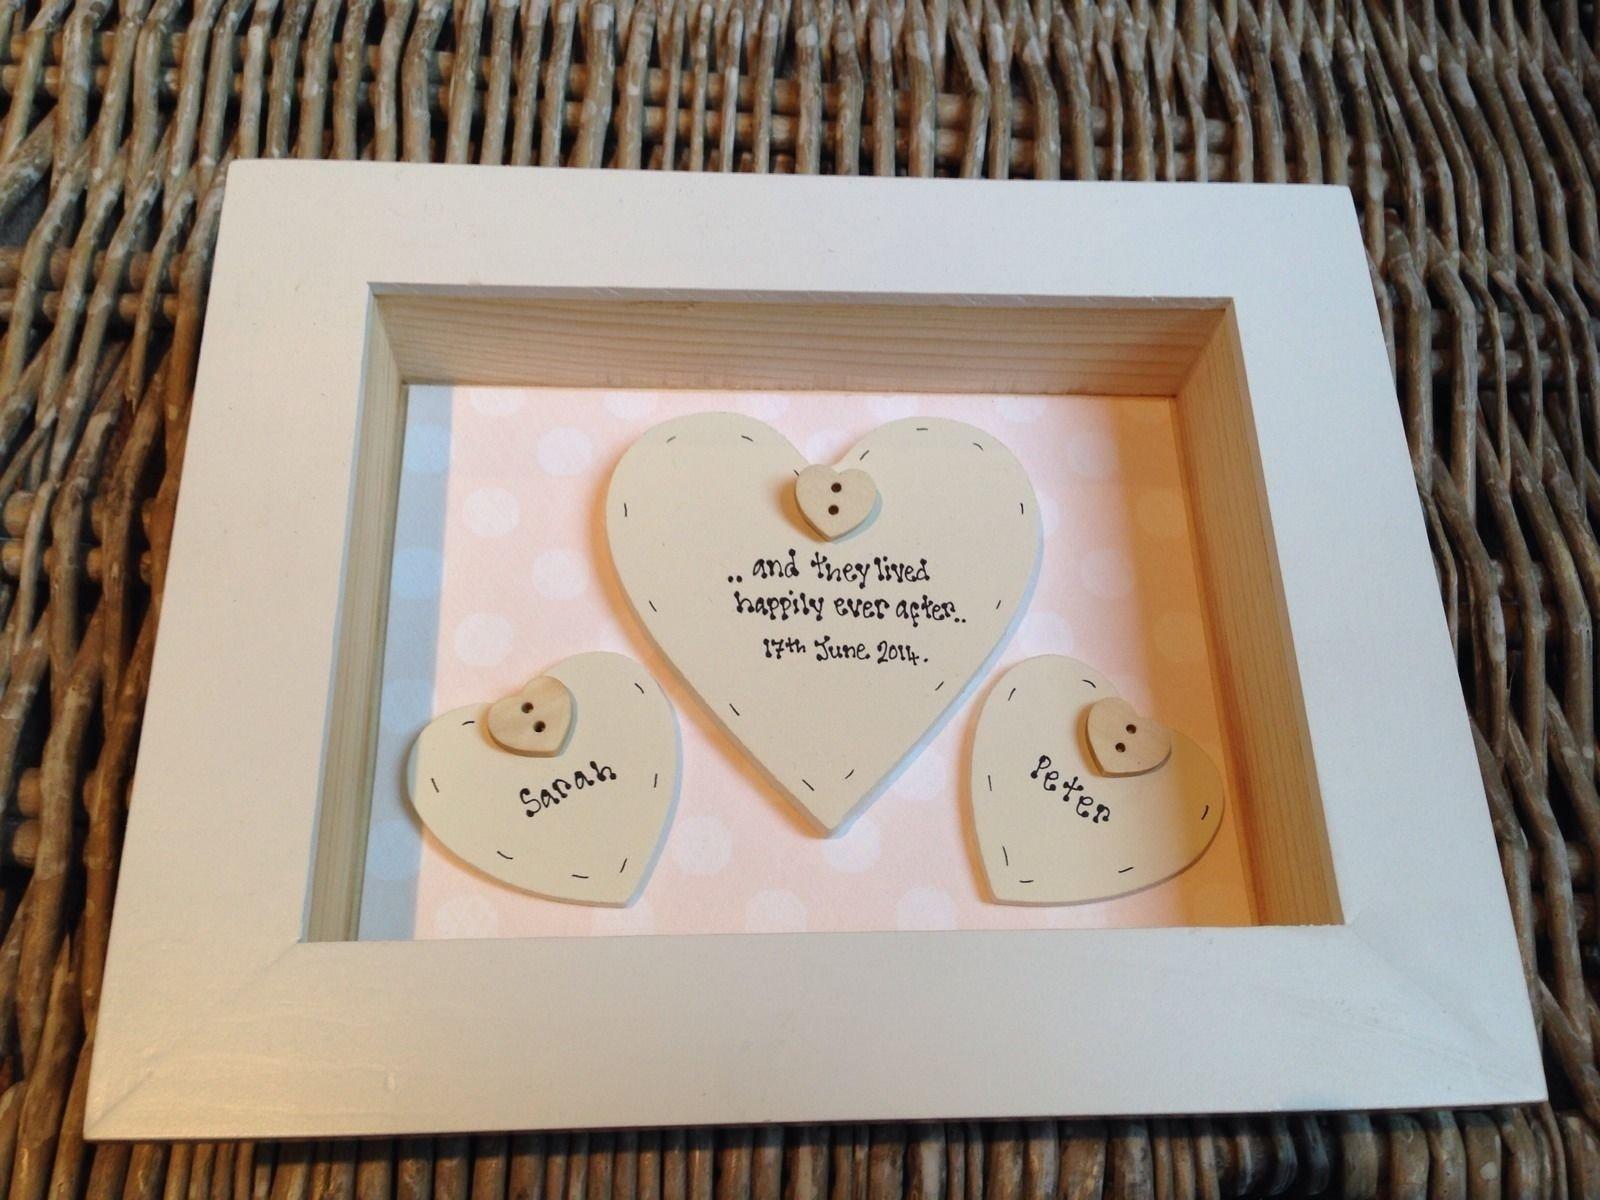 10 pretty groom to bride gift ideas